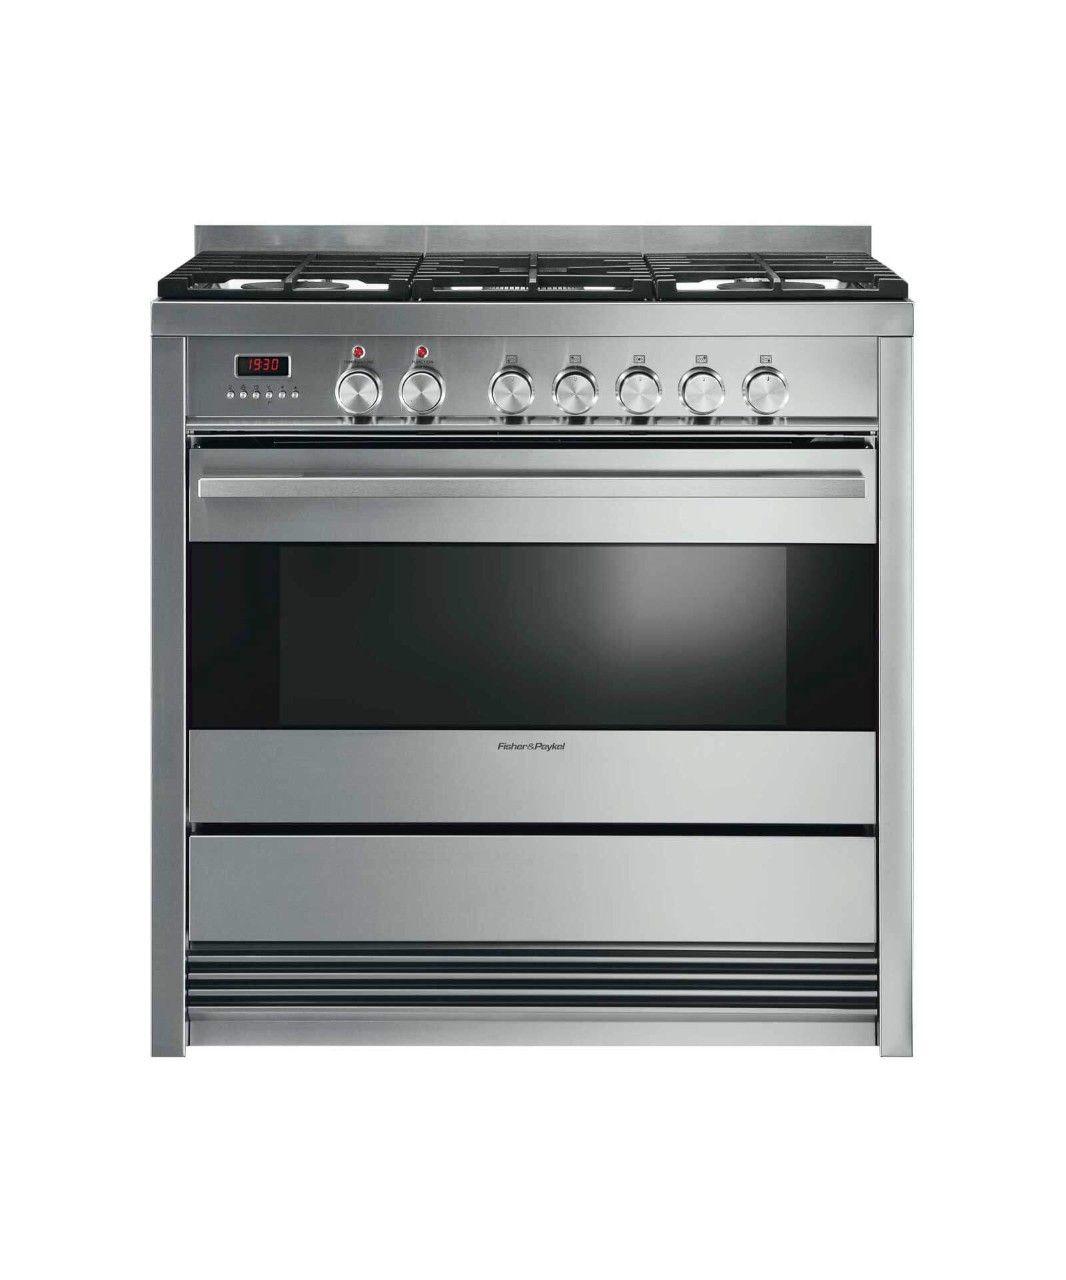 Uncategorized Brisbane Kitchen Appliances stock appliances is best cooking store in brisbane so enjoy grate offer on our